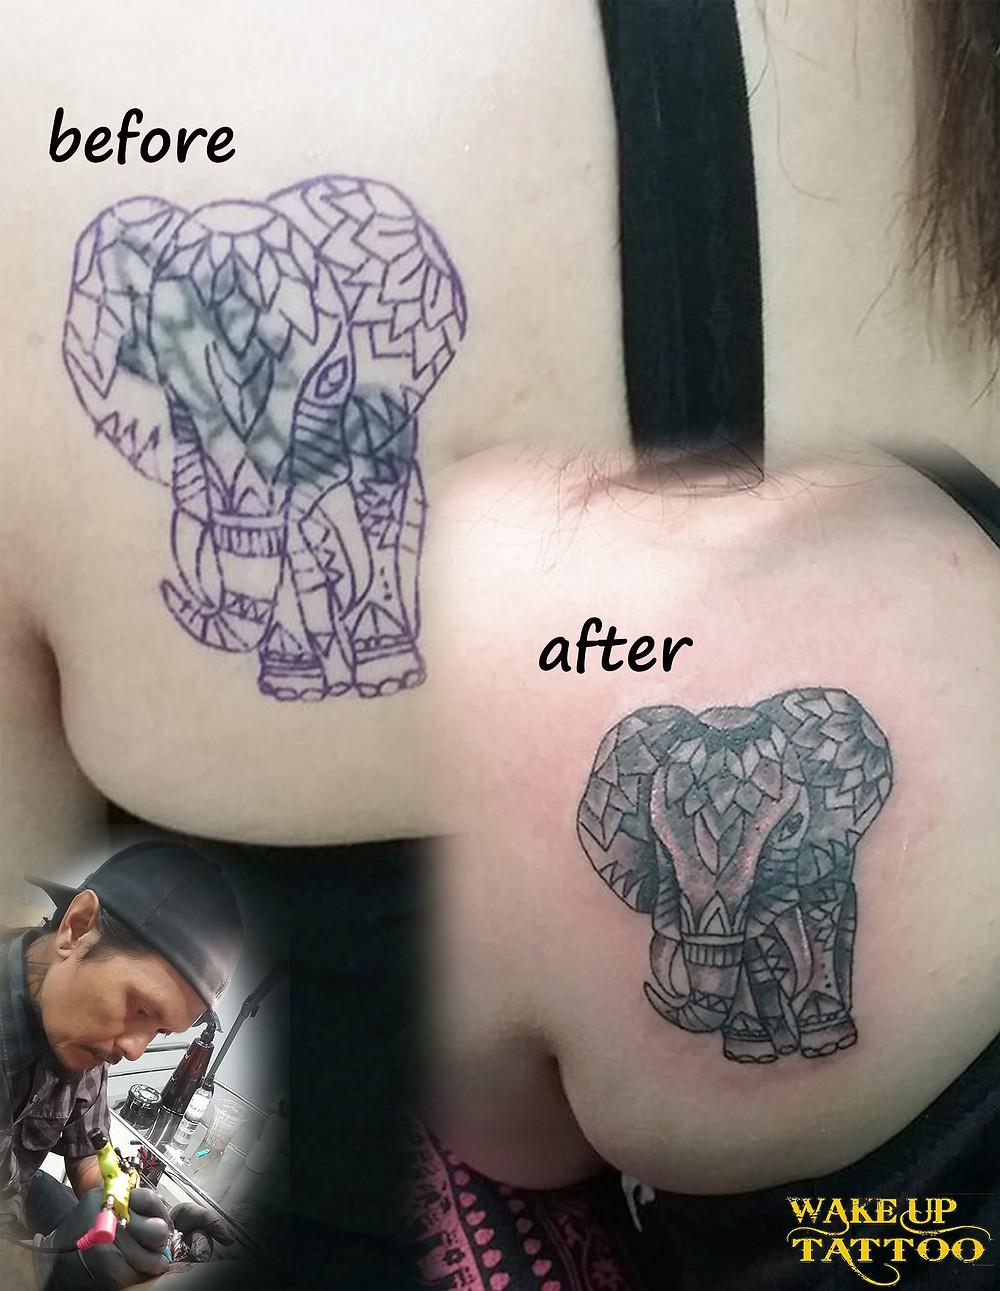 Cover up Tattoo by Wake up Tattoo Phuket at Patong Beach Thailand